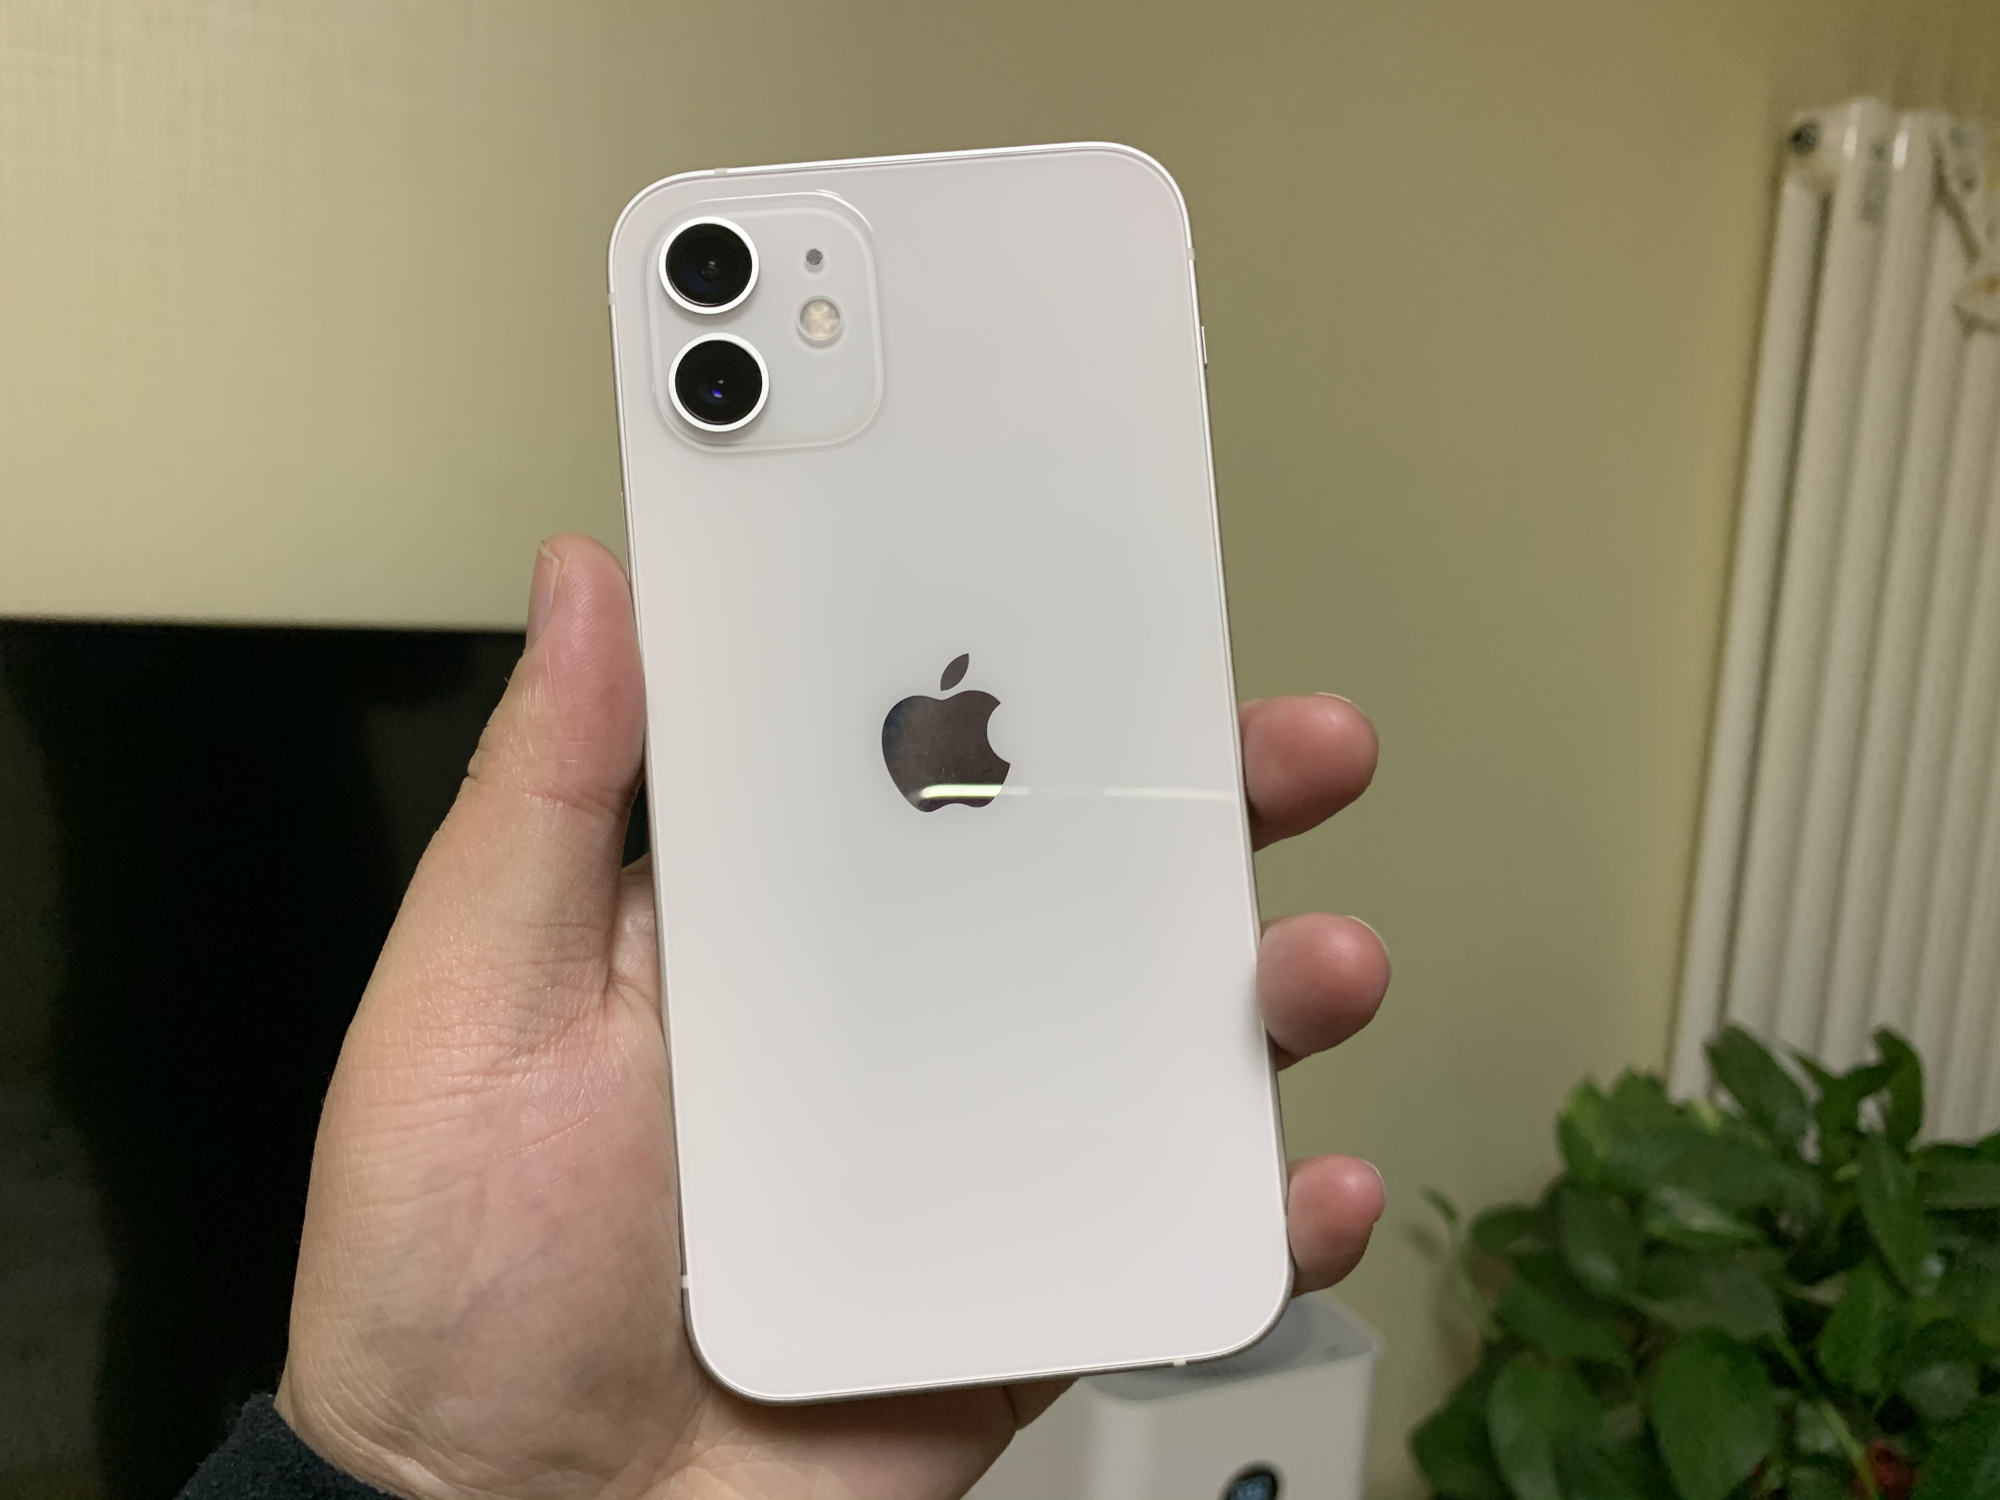 5G手机怎么选?盘点2021年最受欢迎的几款5G手机,你有在用那款吗